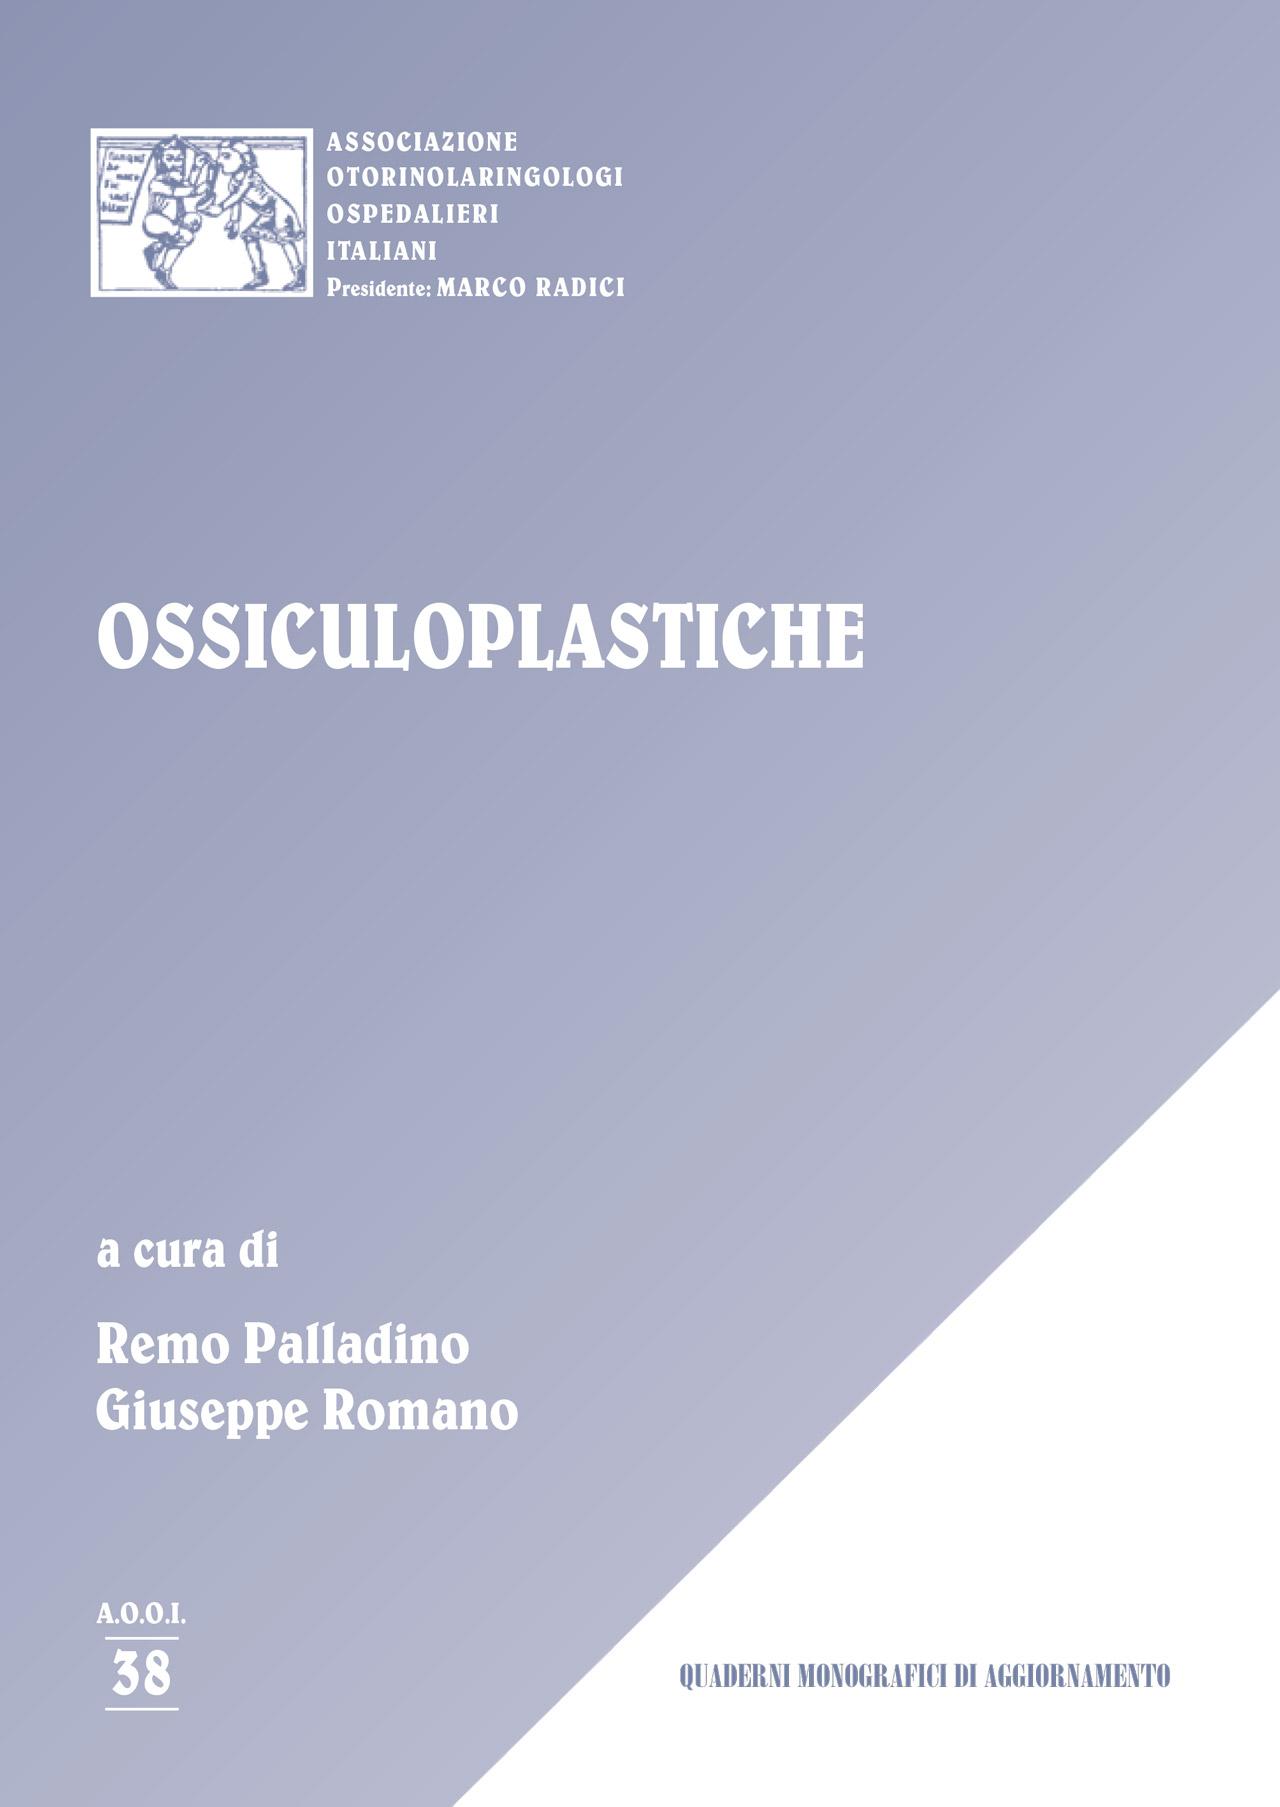 Quaderno-Monografico-AOOI2018-1